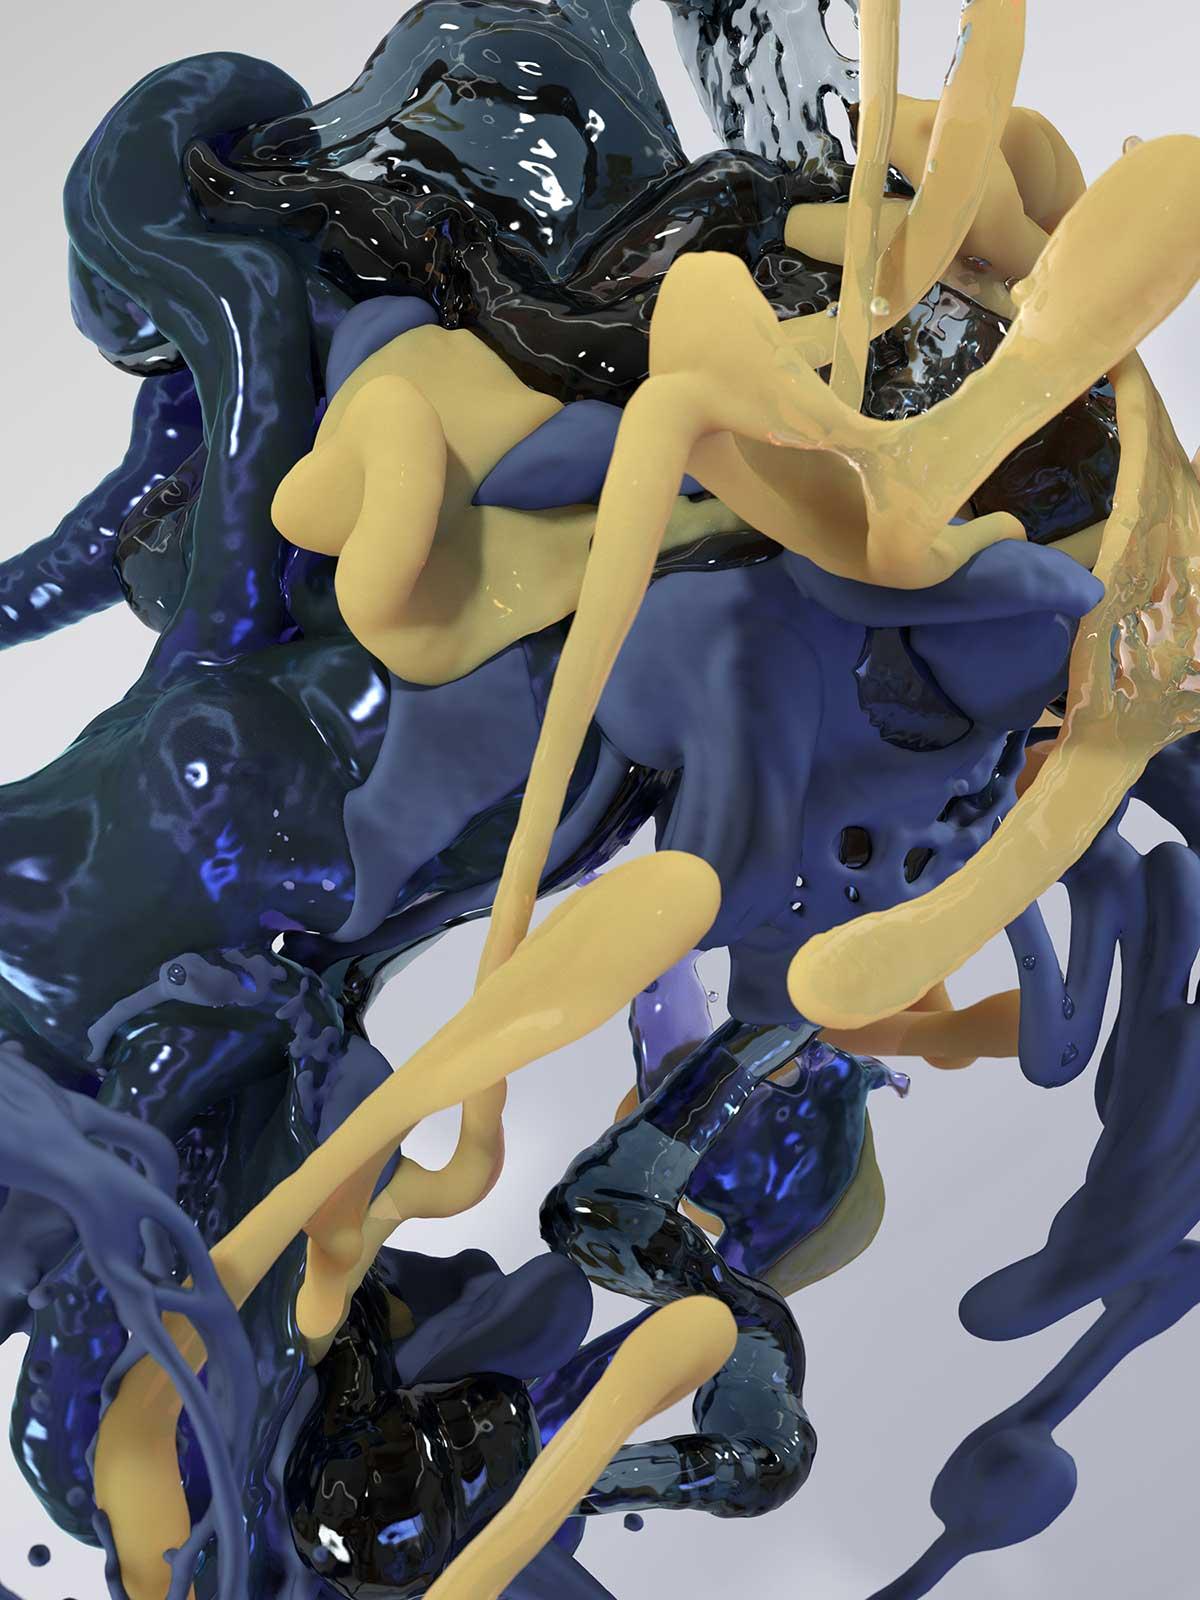 Bodypaint III 19, CGI Fine Art Print, 140 x 105 cm, 2016